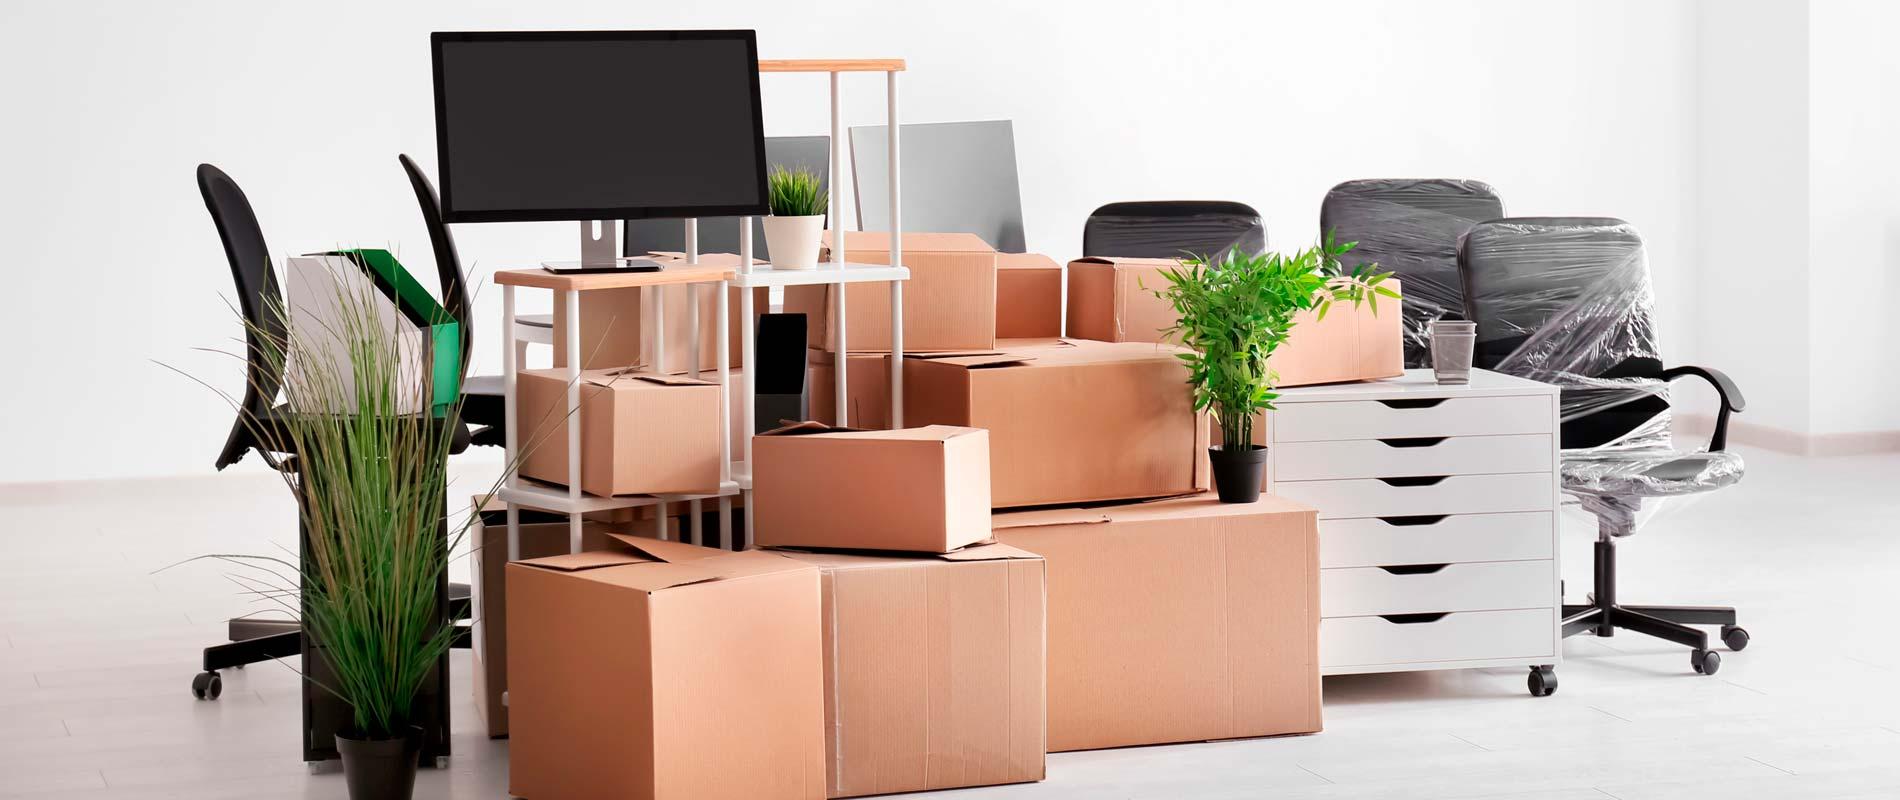 mudanzas para empresas en zaragoza